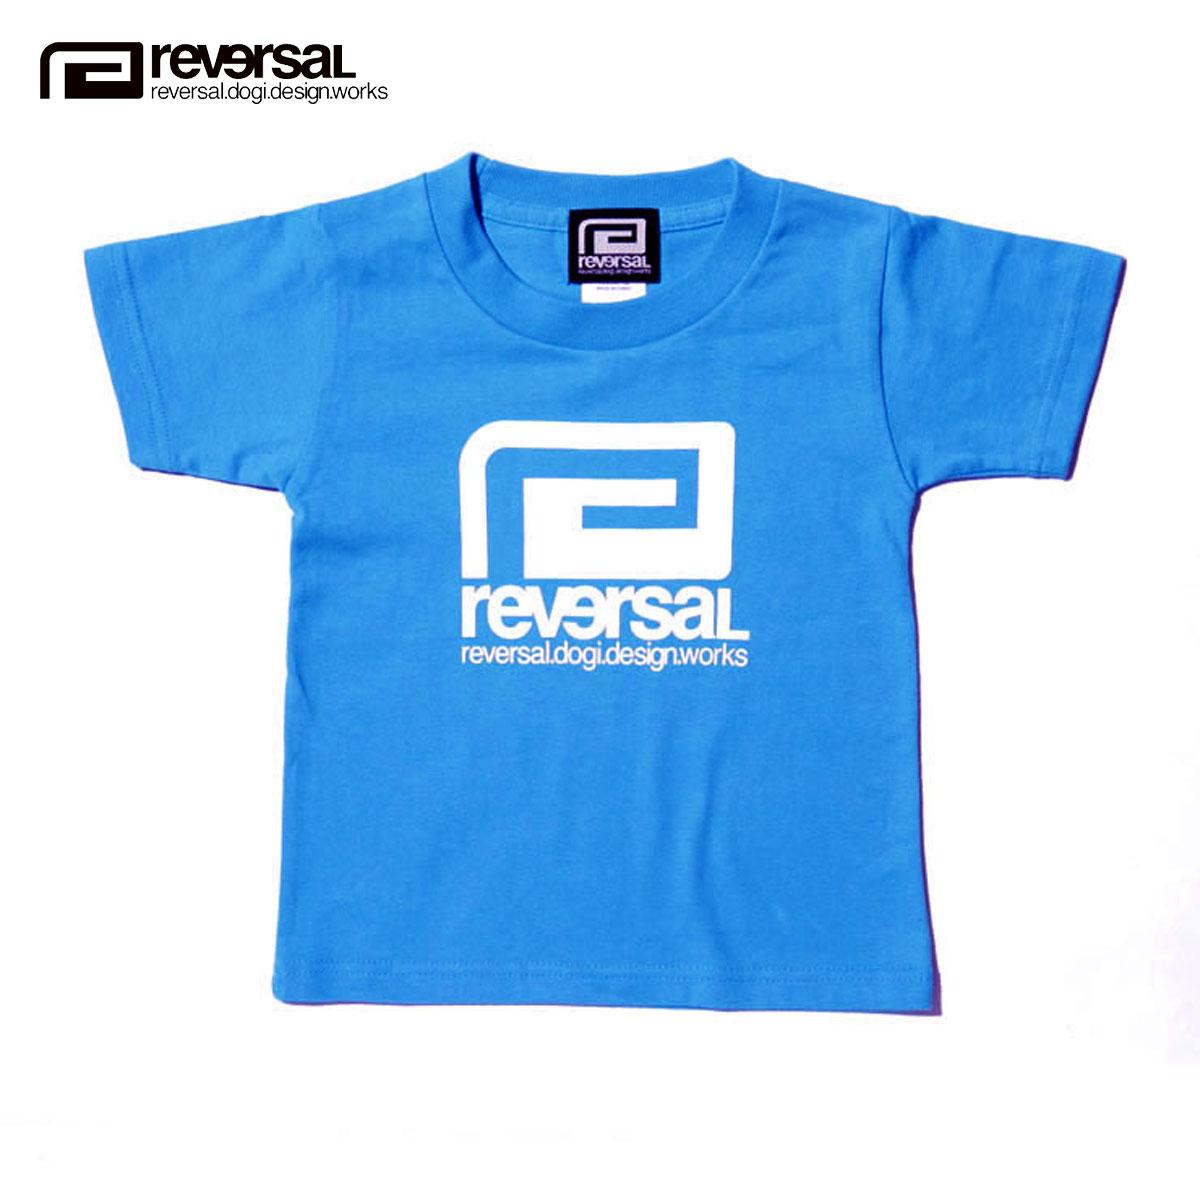 155d2d25b Reversal of REVERSAL regular sale Shop Kids Clothing Short Sleeve T shirt  BIG MARK KIDS TEE rvap16ss027 APPAREL TURQUOISE